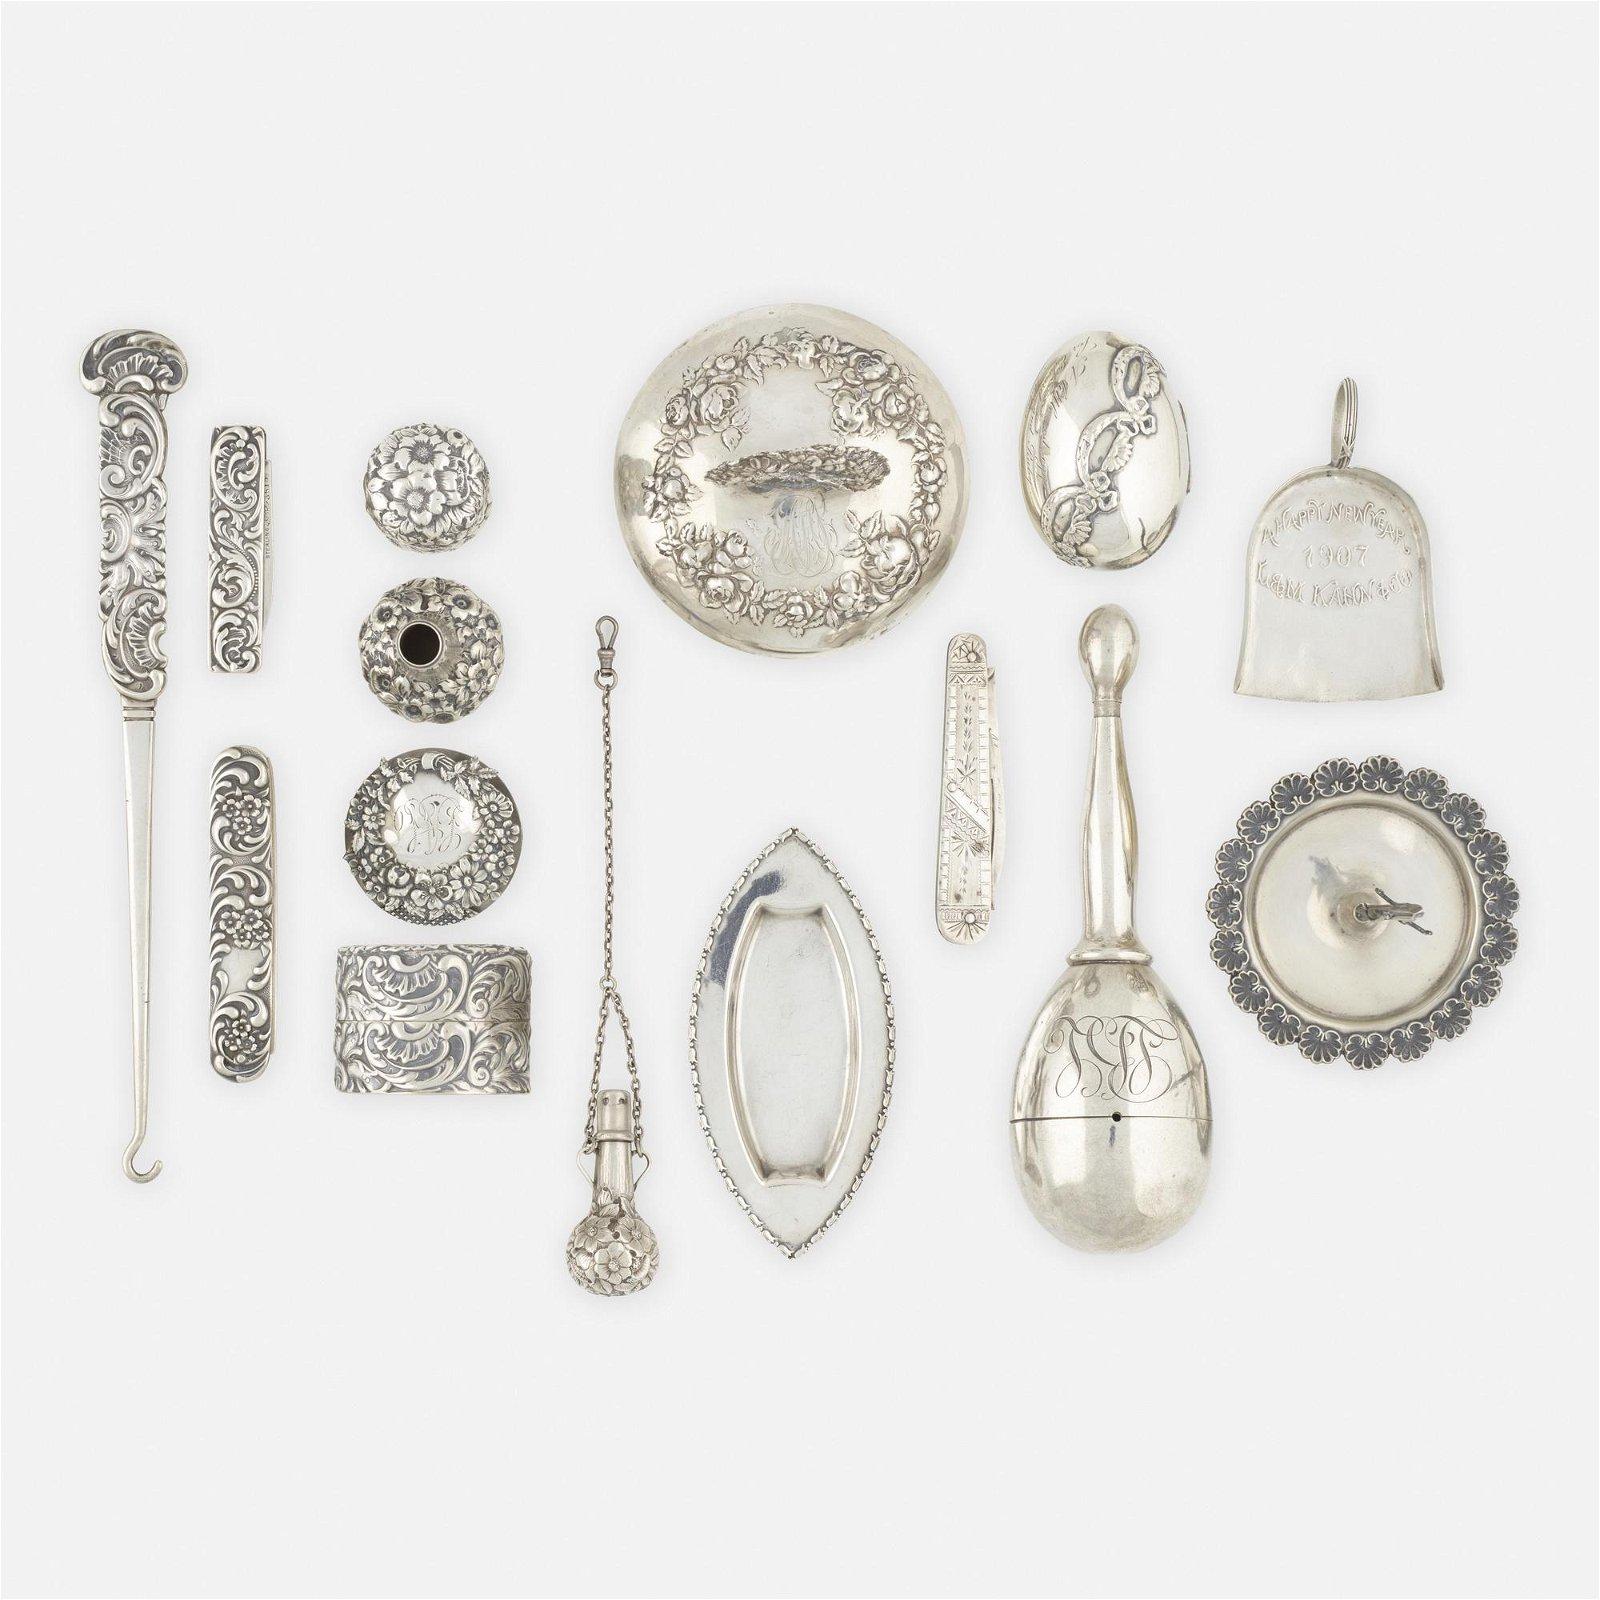 George W. Shiebler & Co., silver objects